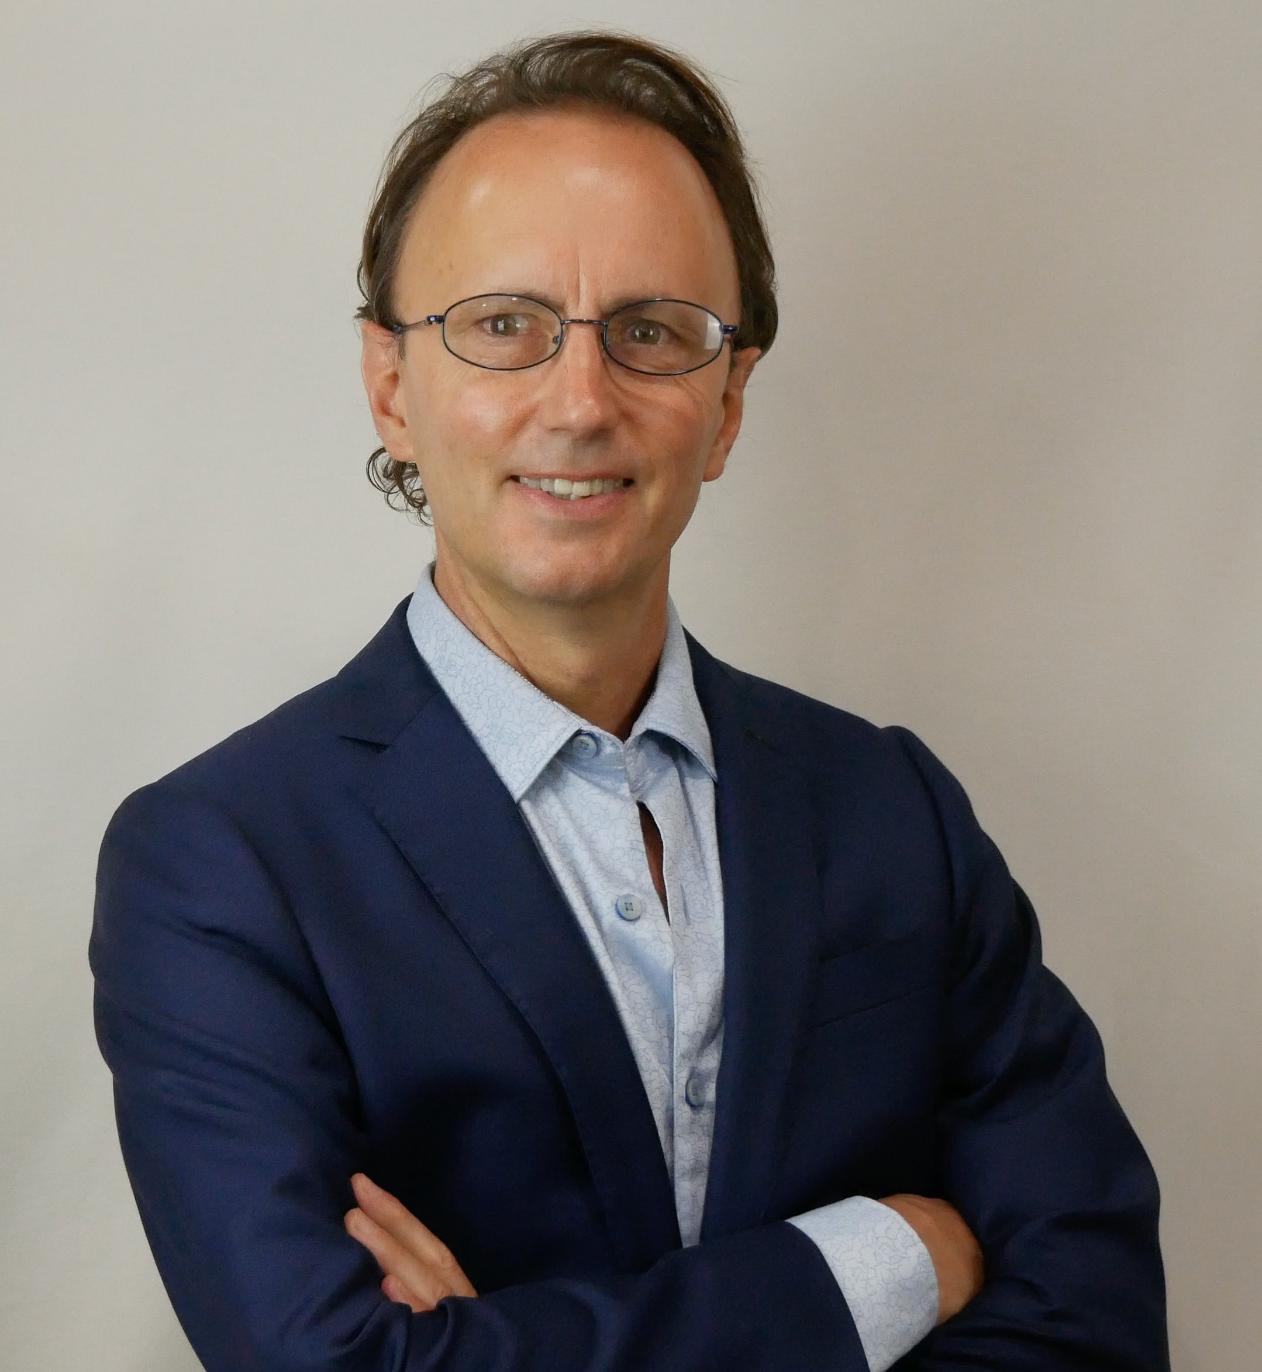 Dr. Dave Tuck Headshot